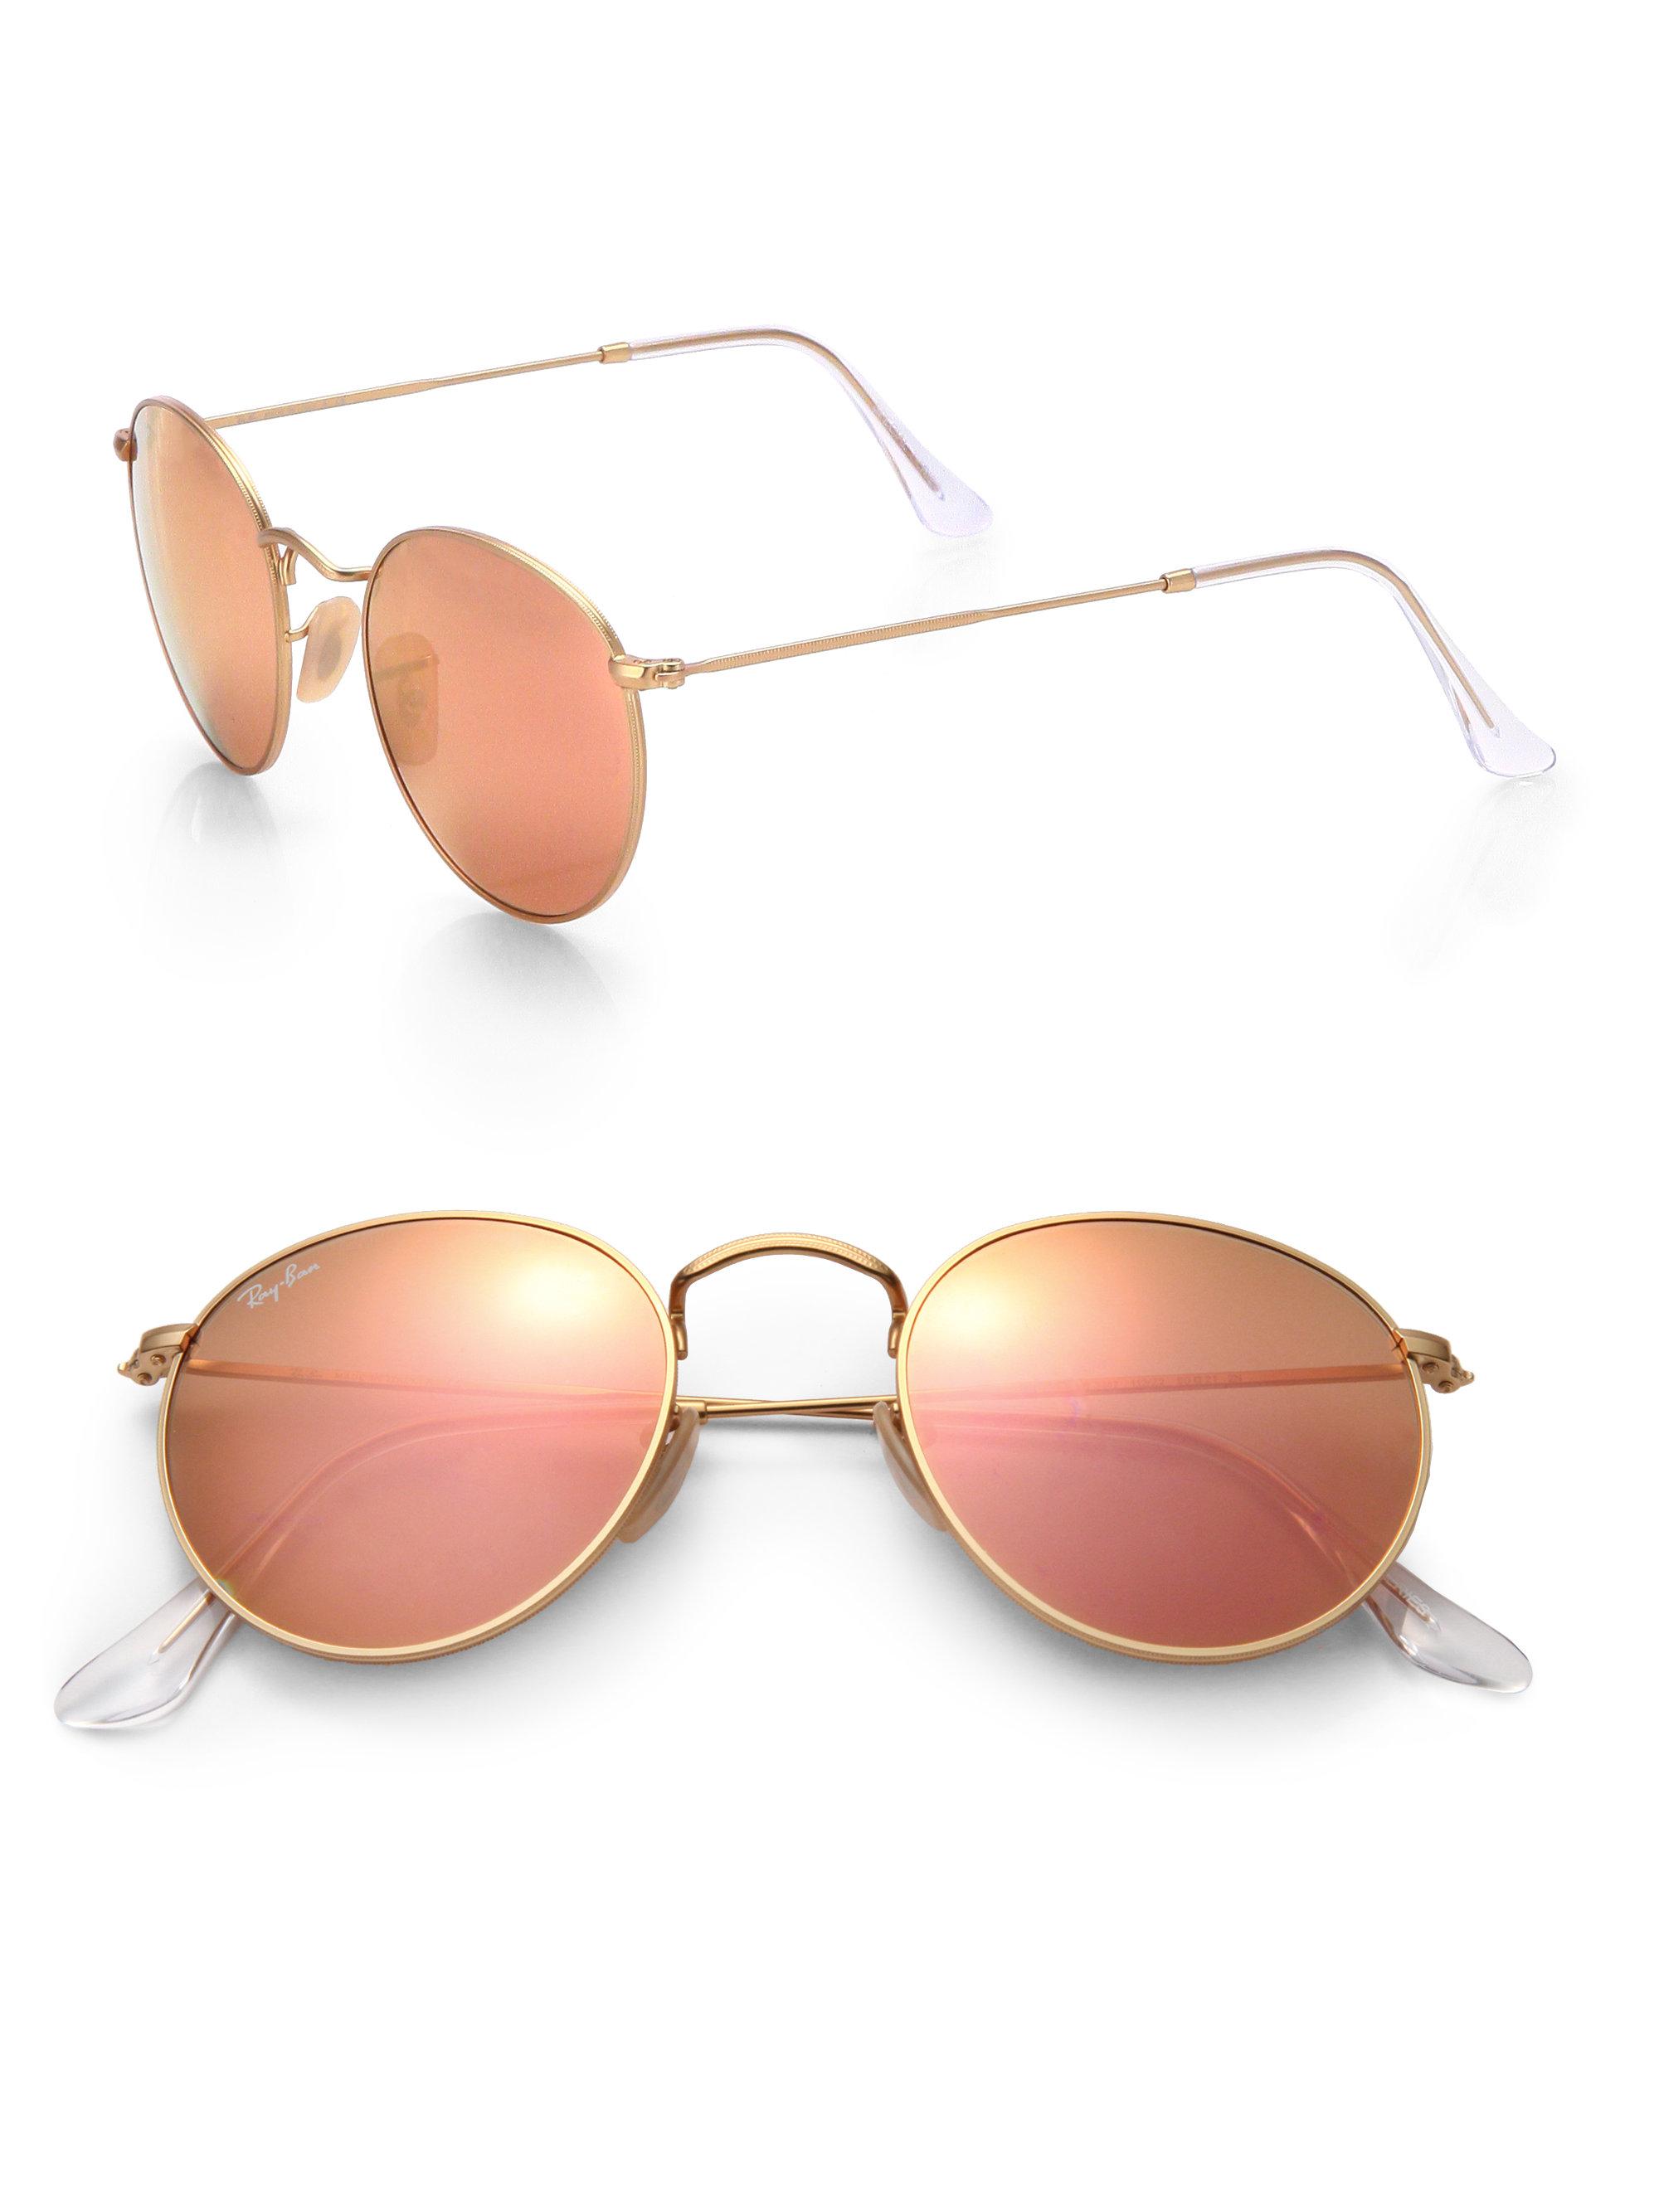 5e4c50d4925 Fake Ray Ban Sunglasses Round Metal « Heritage Malta